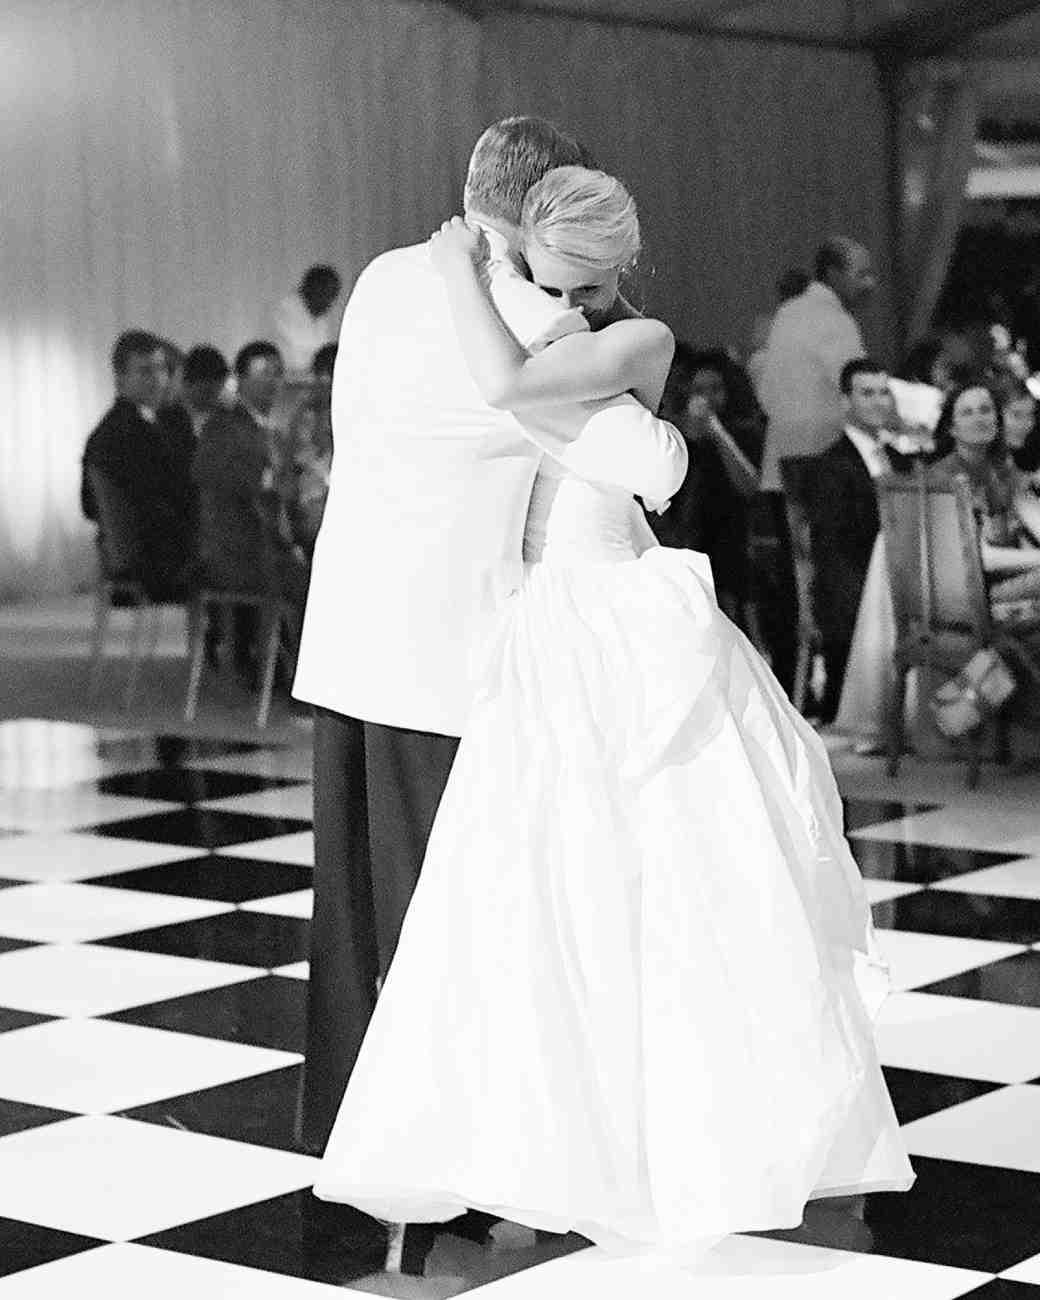 cameron-jake-wedding-maryland-1148-s112481.jpg